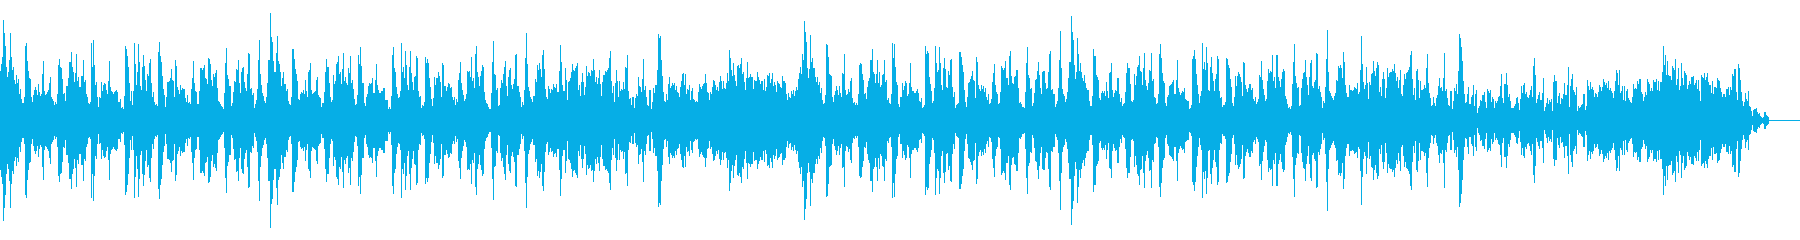 Surprise が飛び出すイメージ曲の再生済みの波形